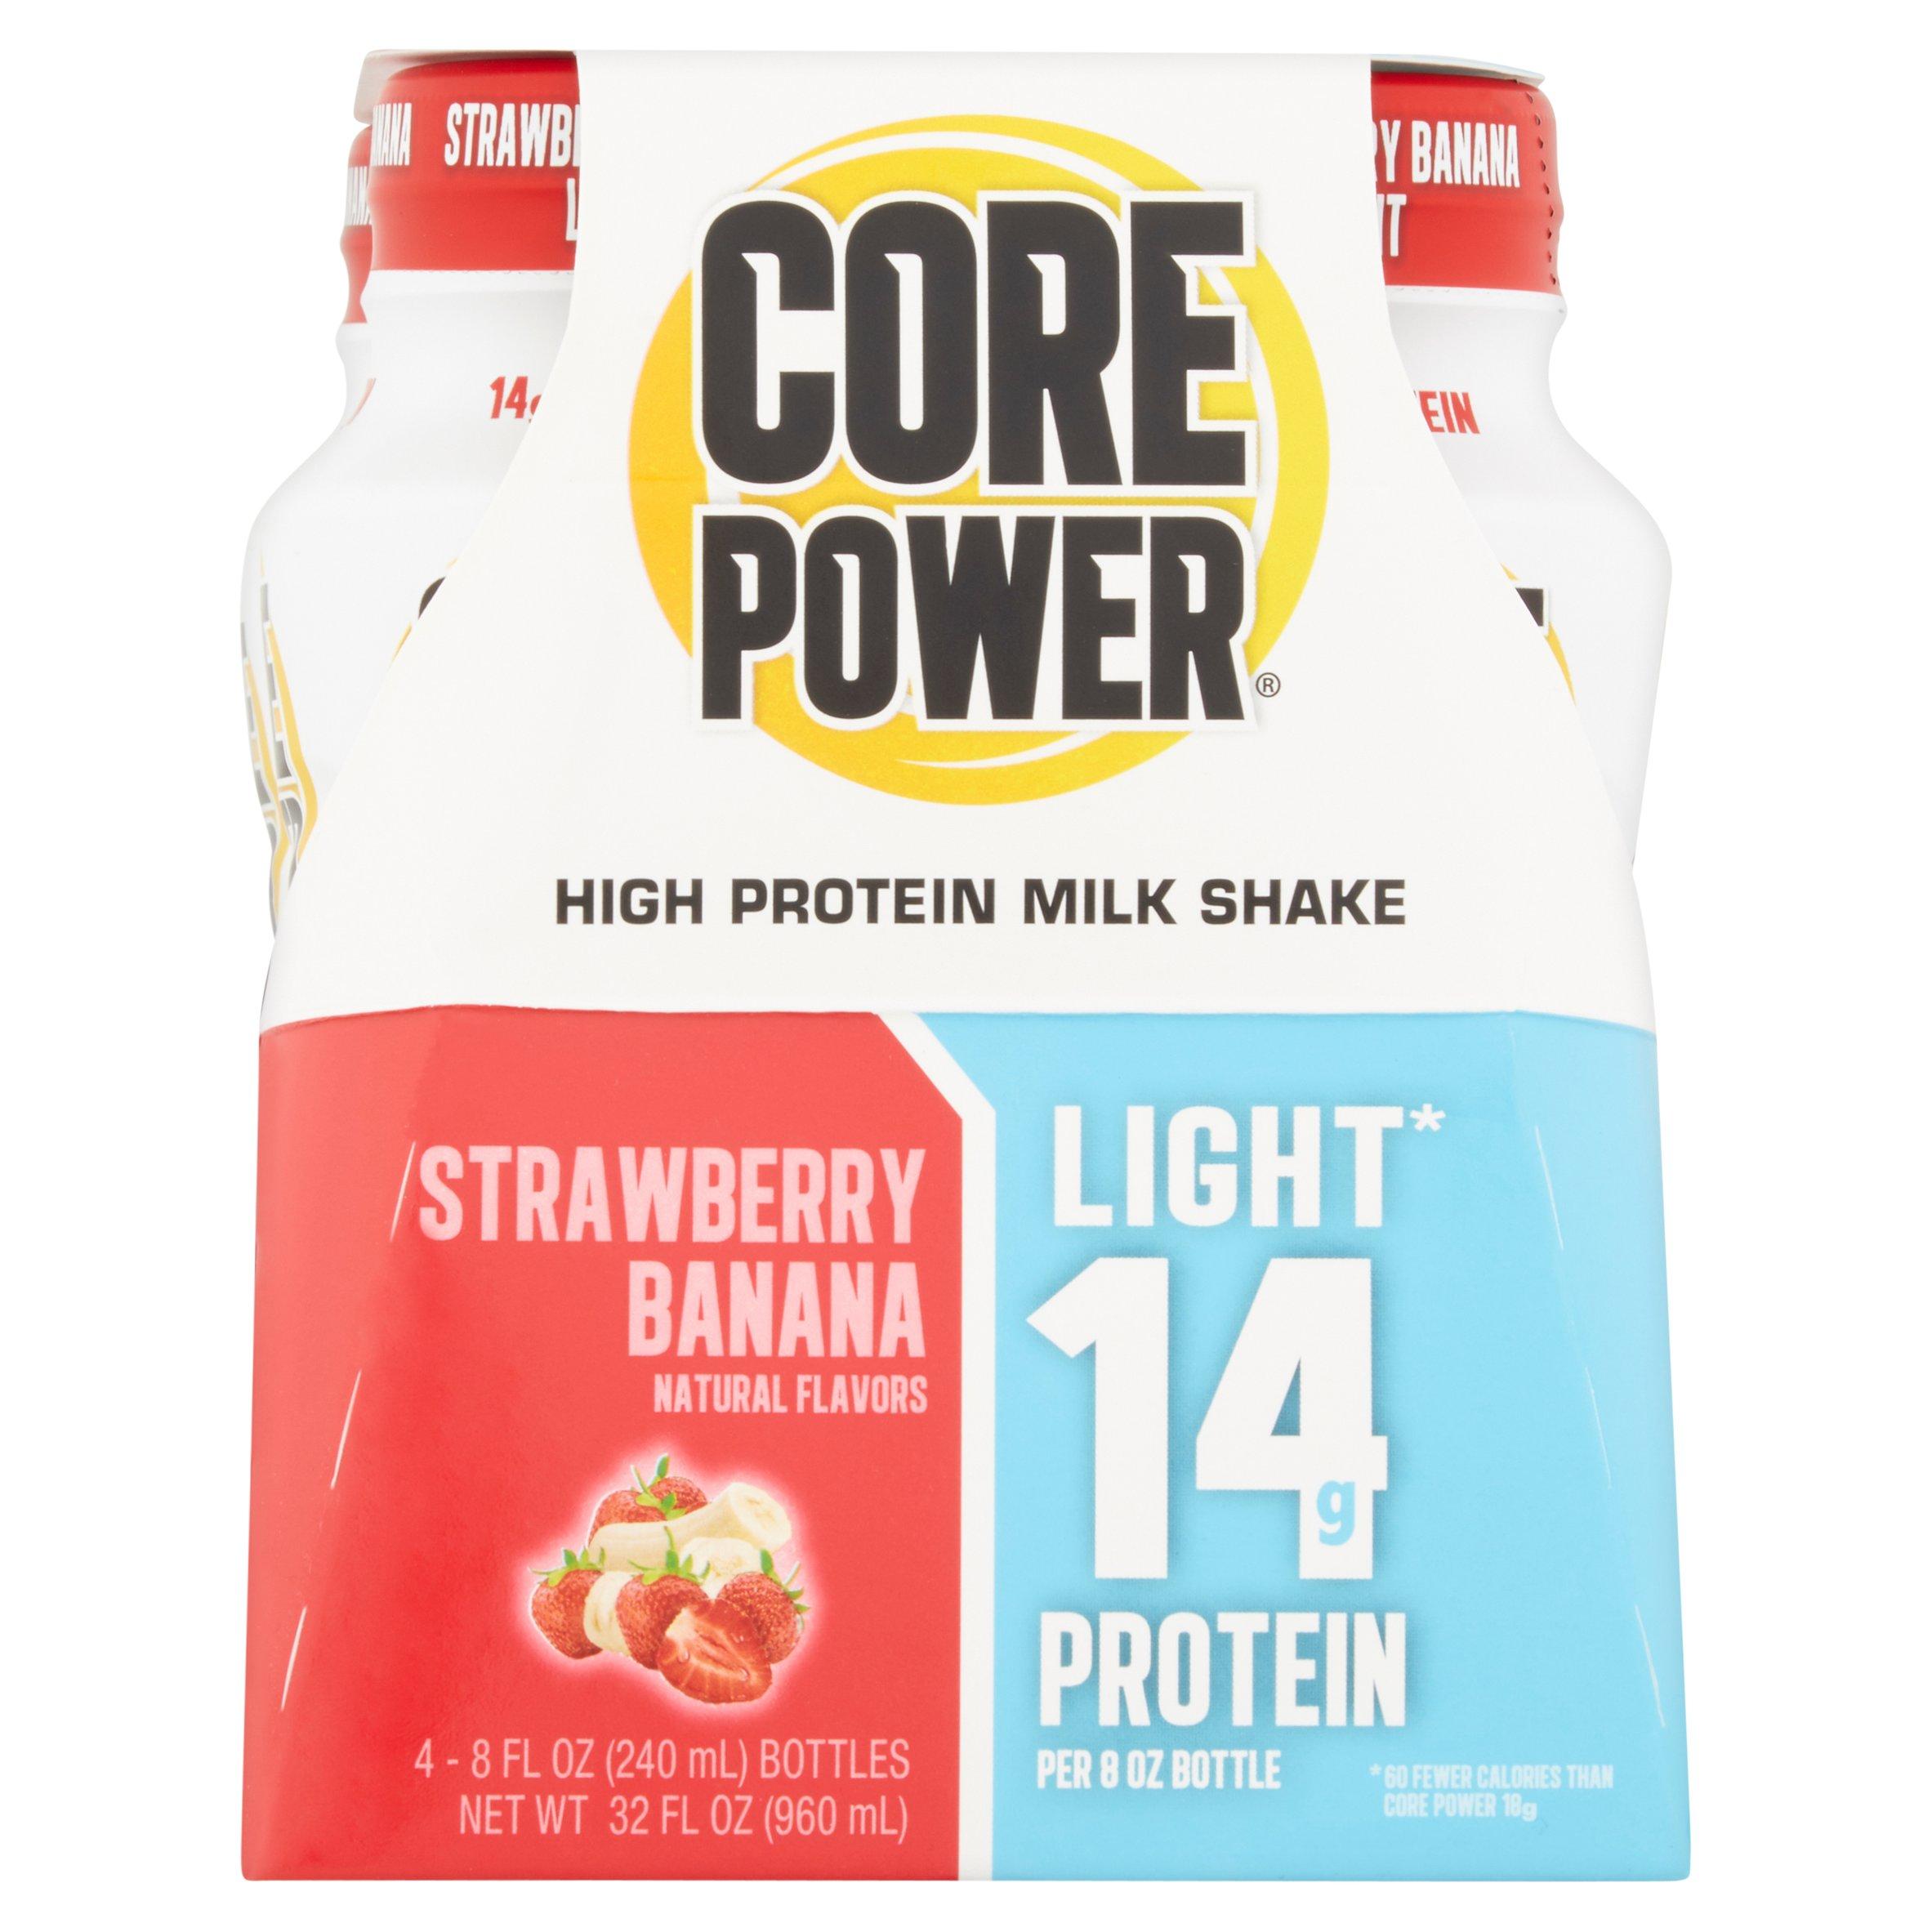 Core Power Strawberry Banana High Protein Milk Shake, 8 fl oz, 4 pack